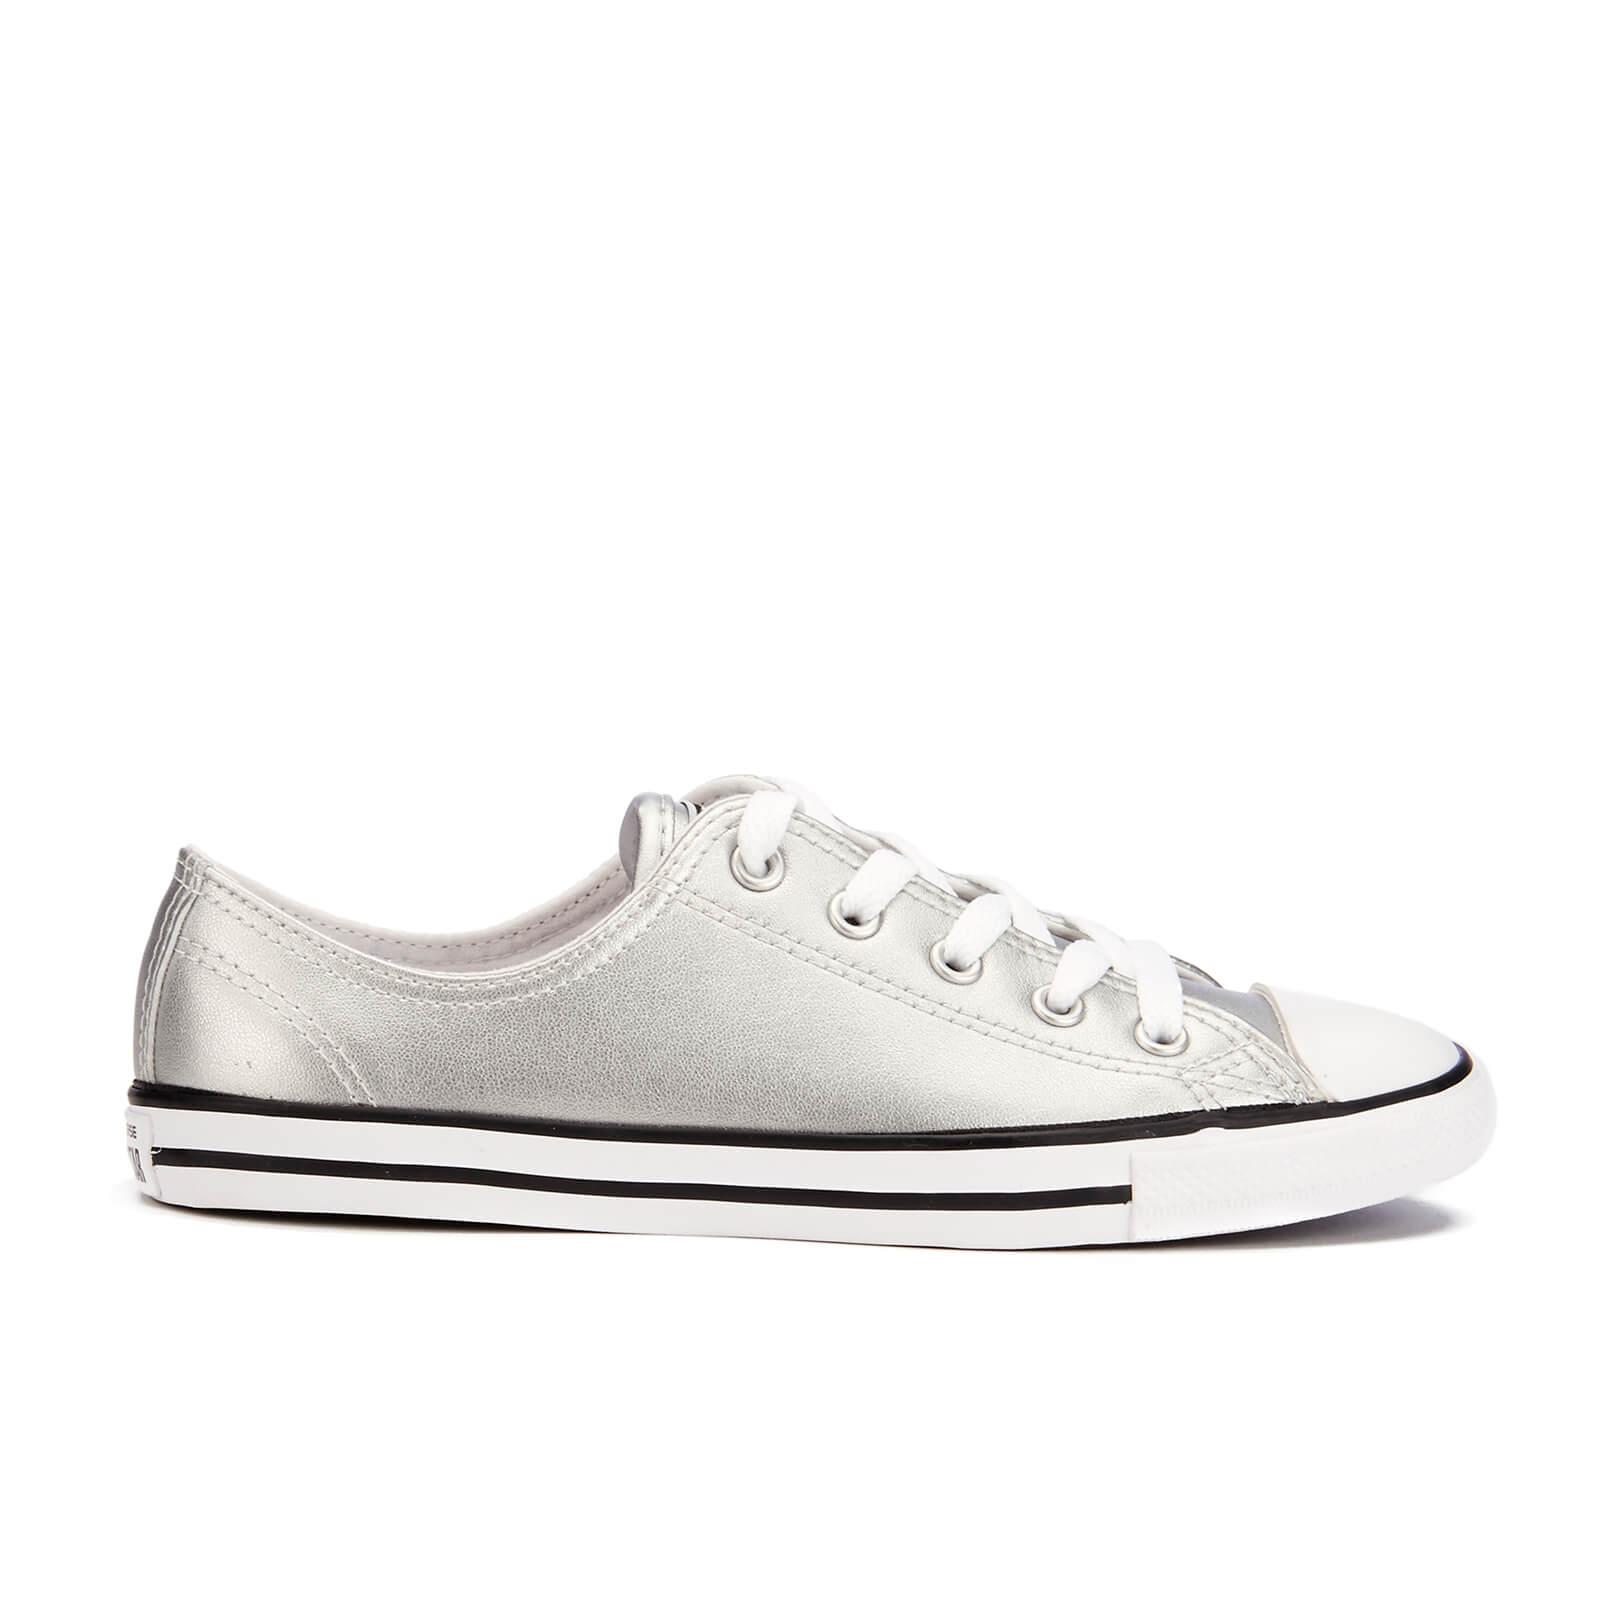 70e566b07771 ... Converse Women s Chuck Taylor All Star Dainty Ox Trainers -  Silver Black White